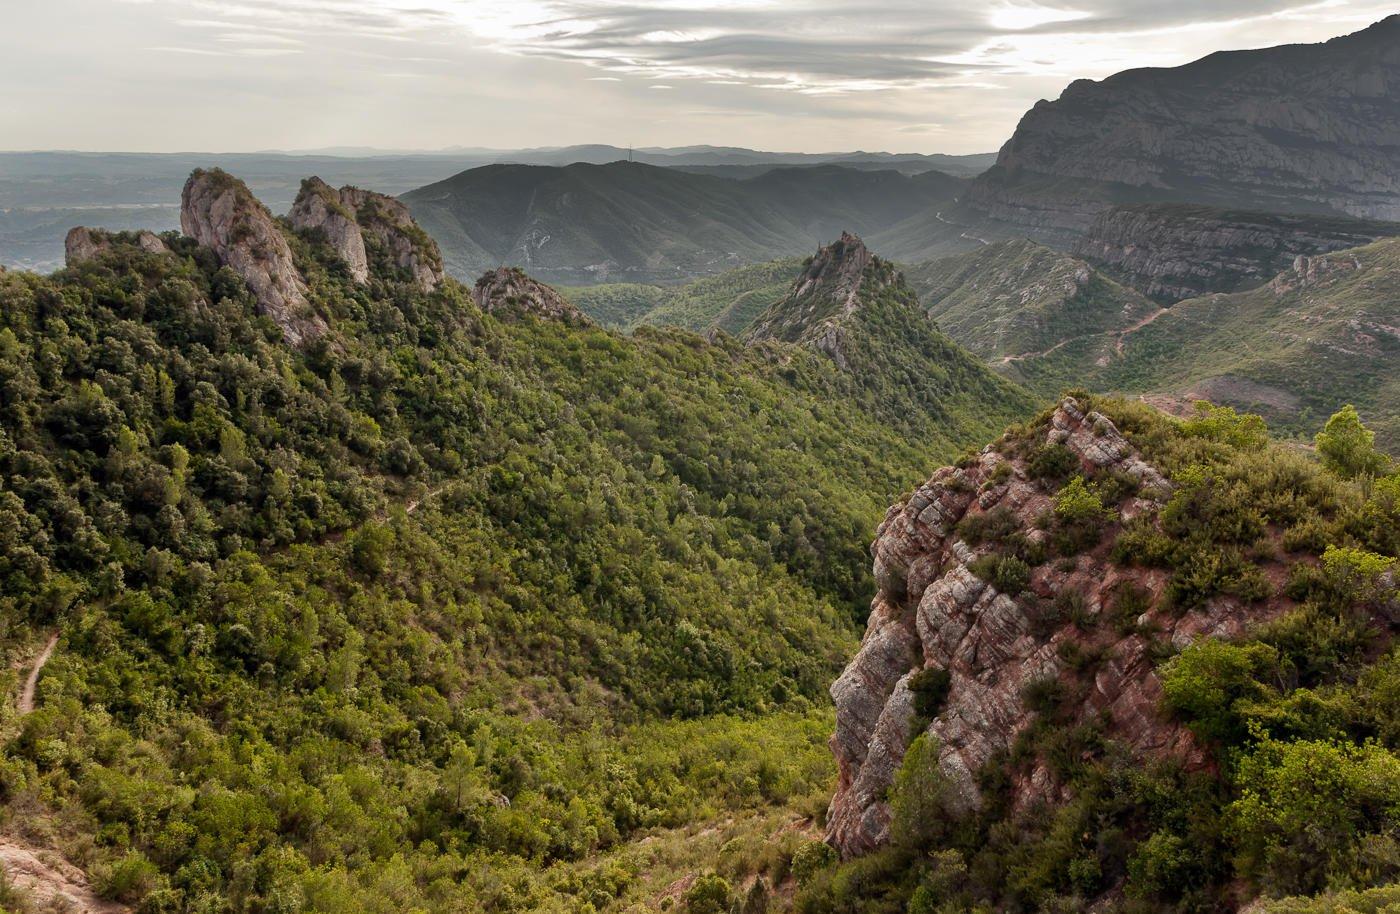 Camino al Puig de L´Hospici (Miguel Angel Vázquez Márquez)